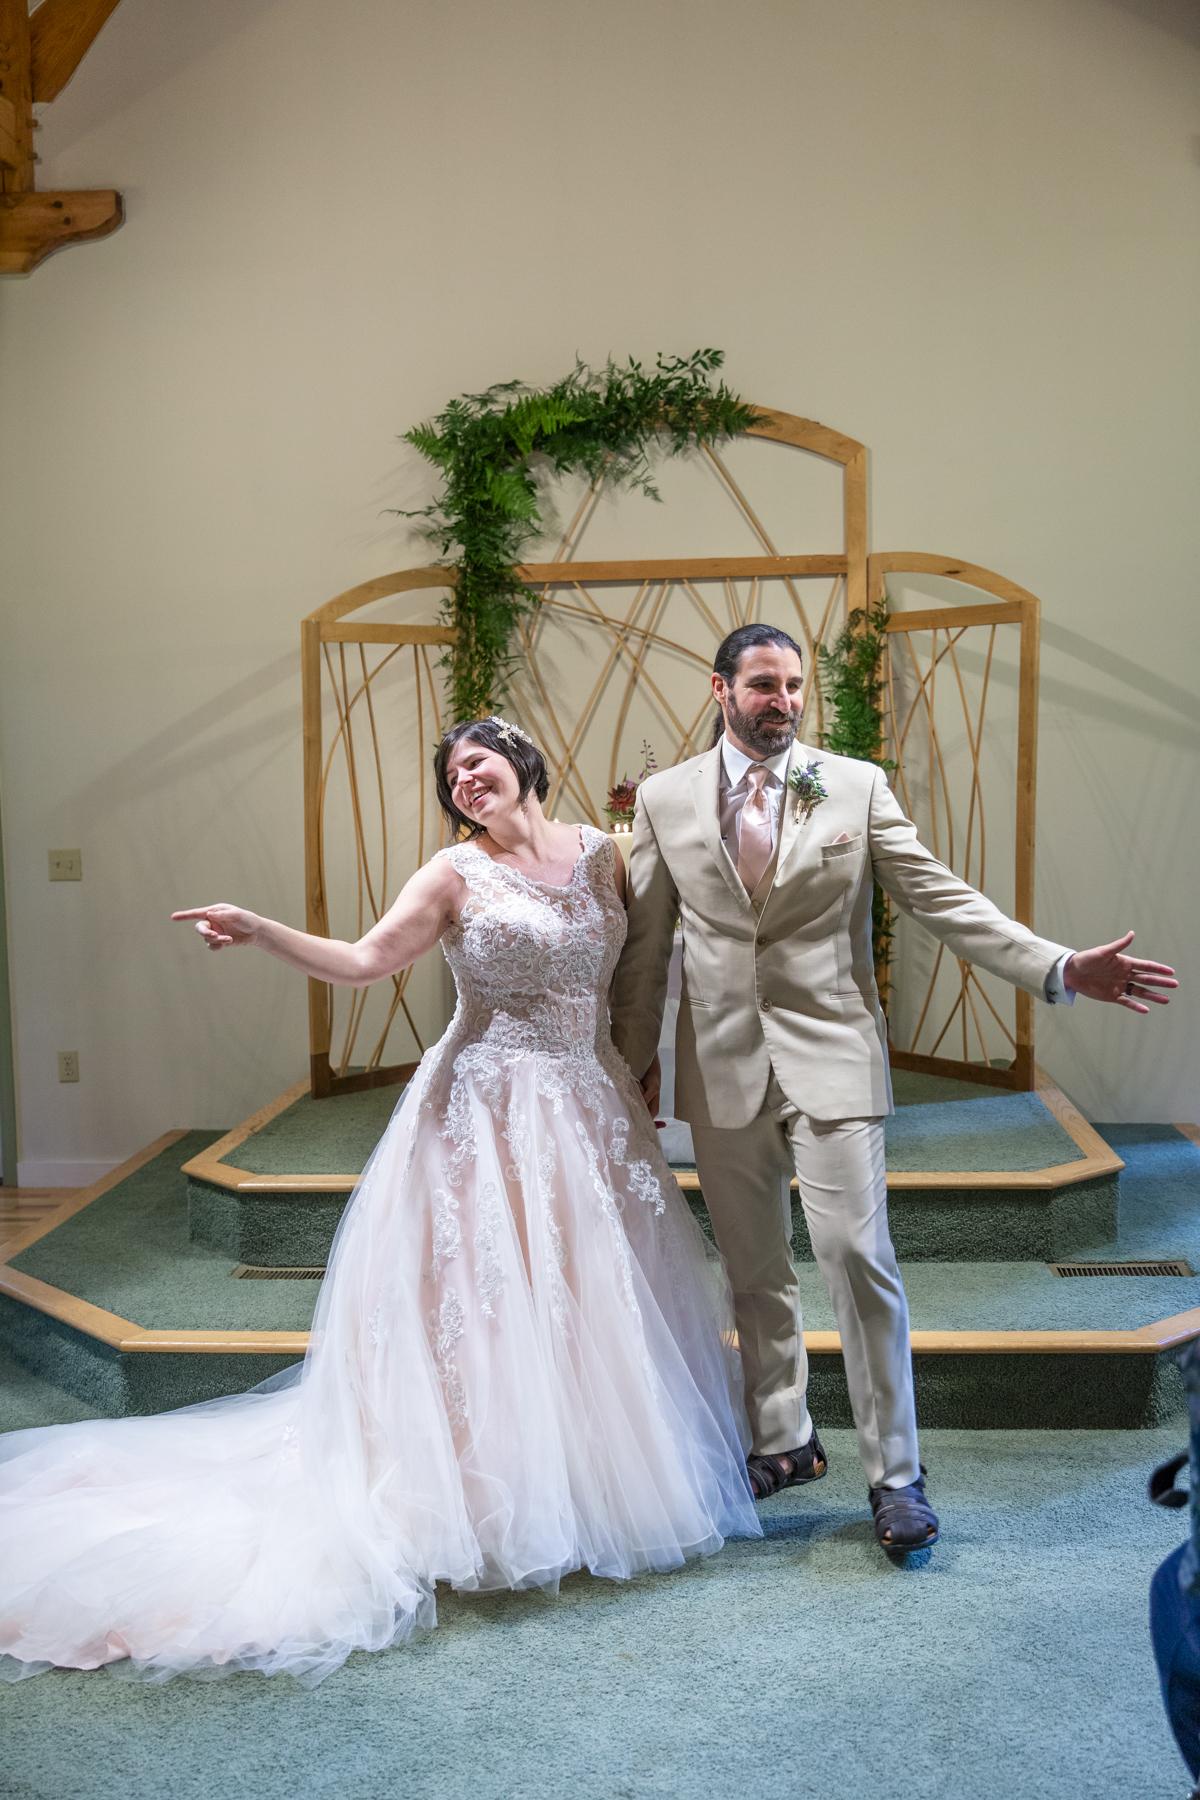 Avyanna and Phoenix Wedding- Photos by Studio Misha_BLOG-214.jpg